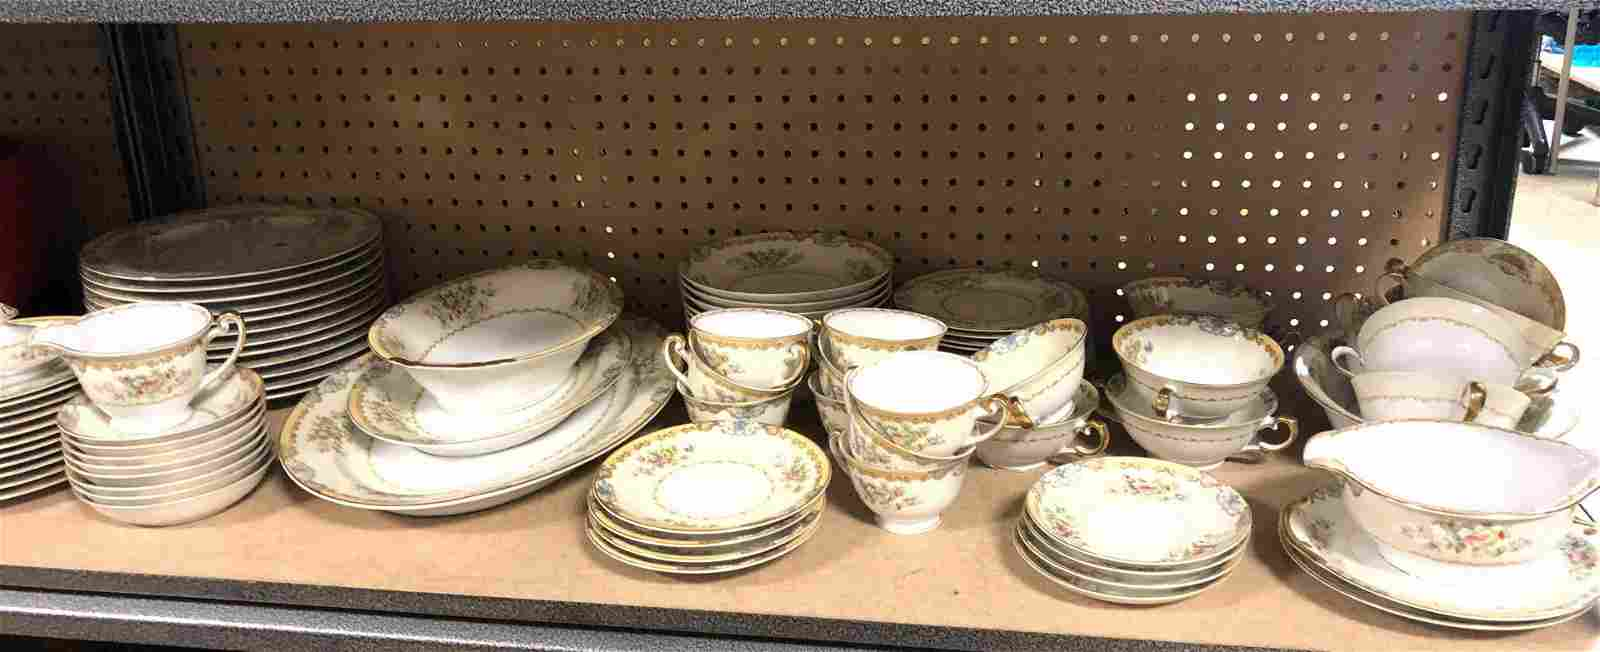 Lot of Meito LANGDON pattern china dinnerware set.